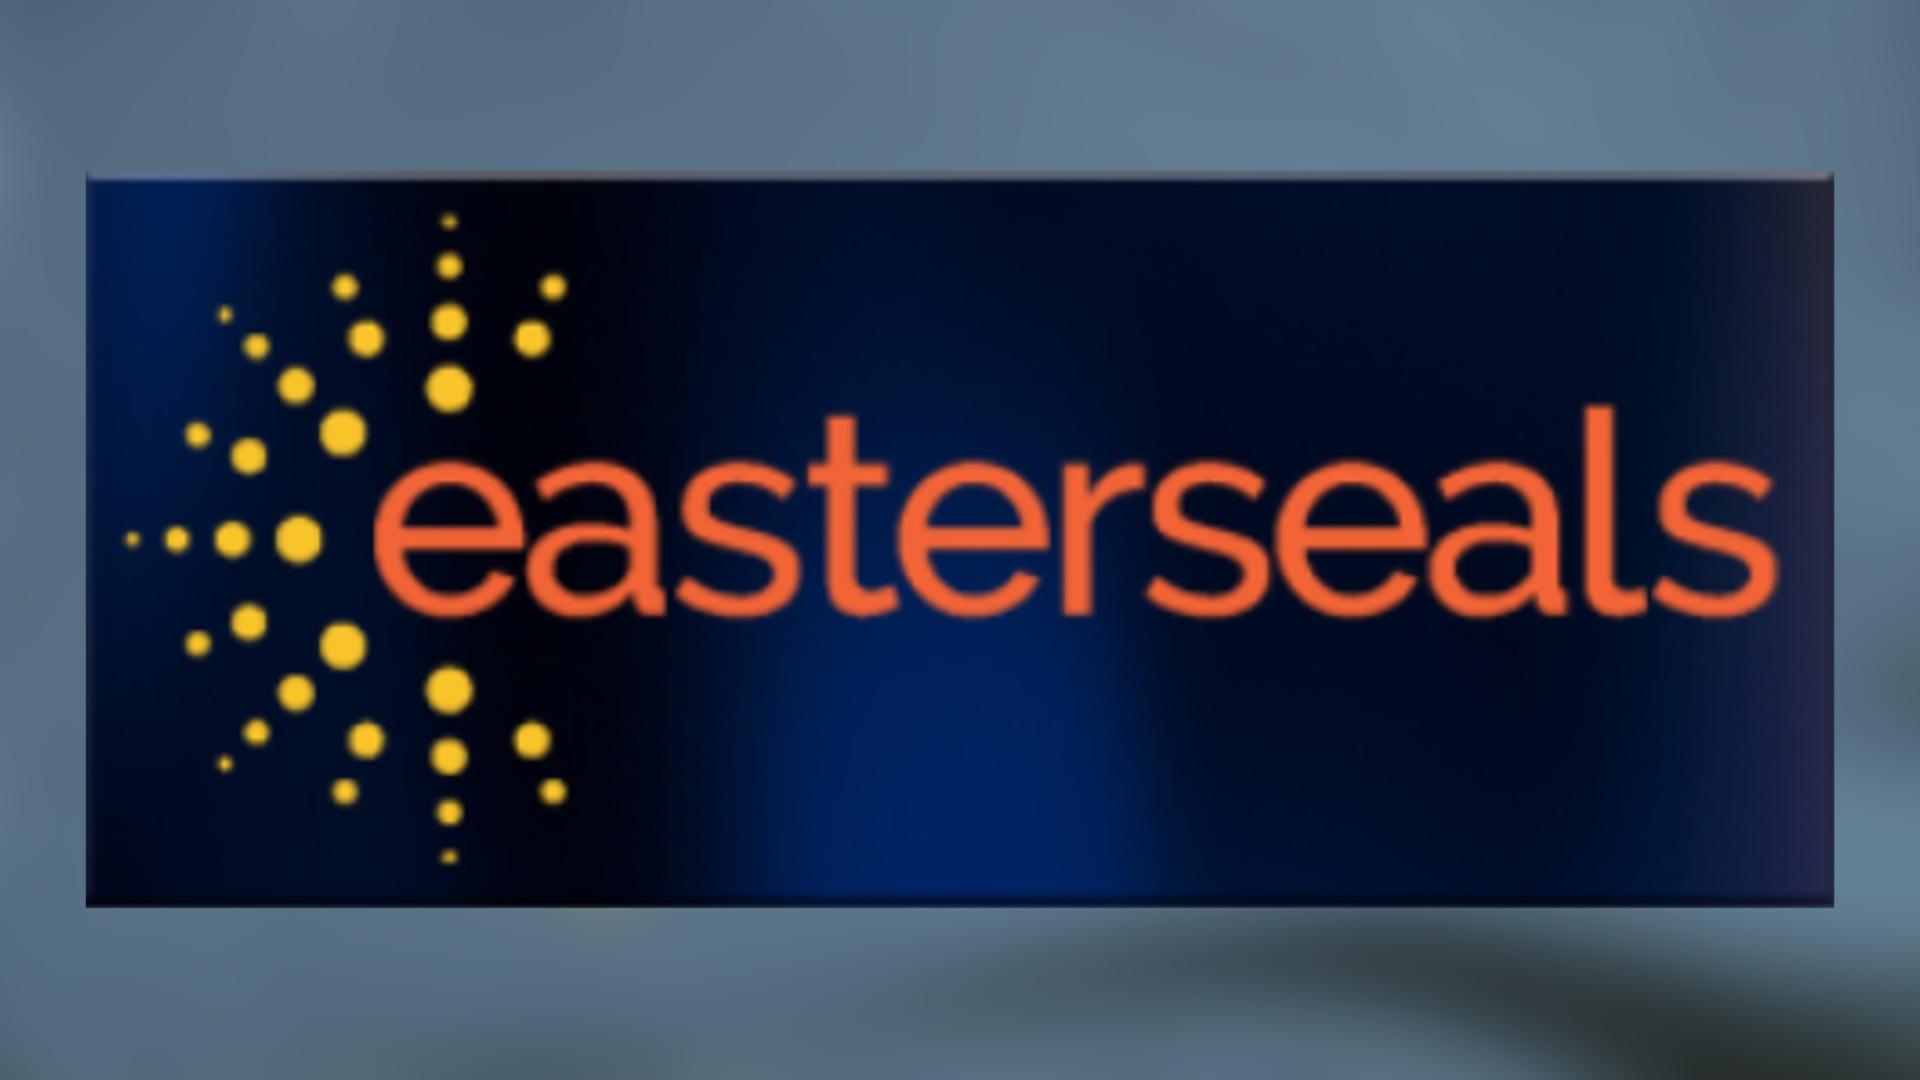 Easter seals new logo_1522789888441.jpg